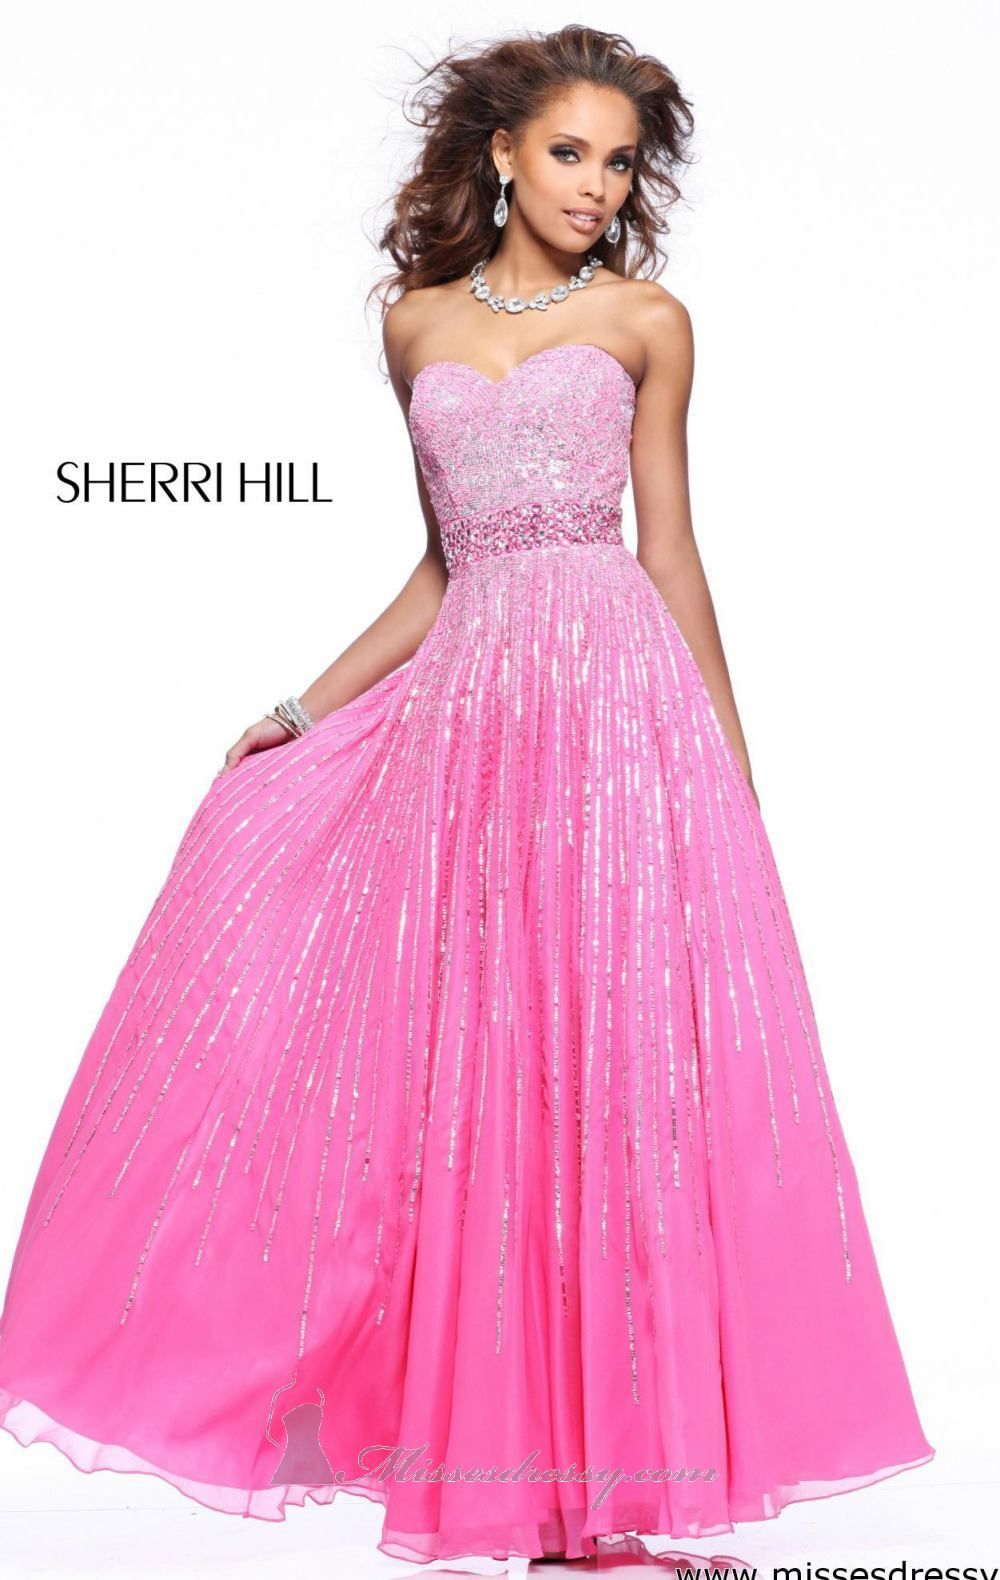 Prom Dresses 2014 | MissesDressy.com | Oh my dresses!! | Pinterest ...